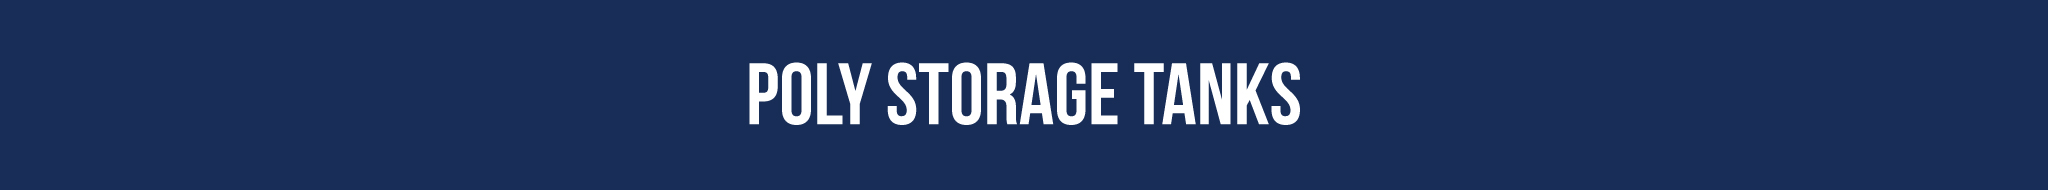 storage-tanks.jpg